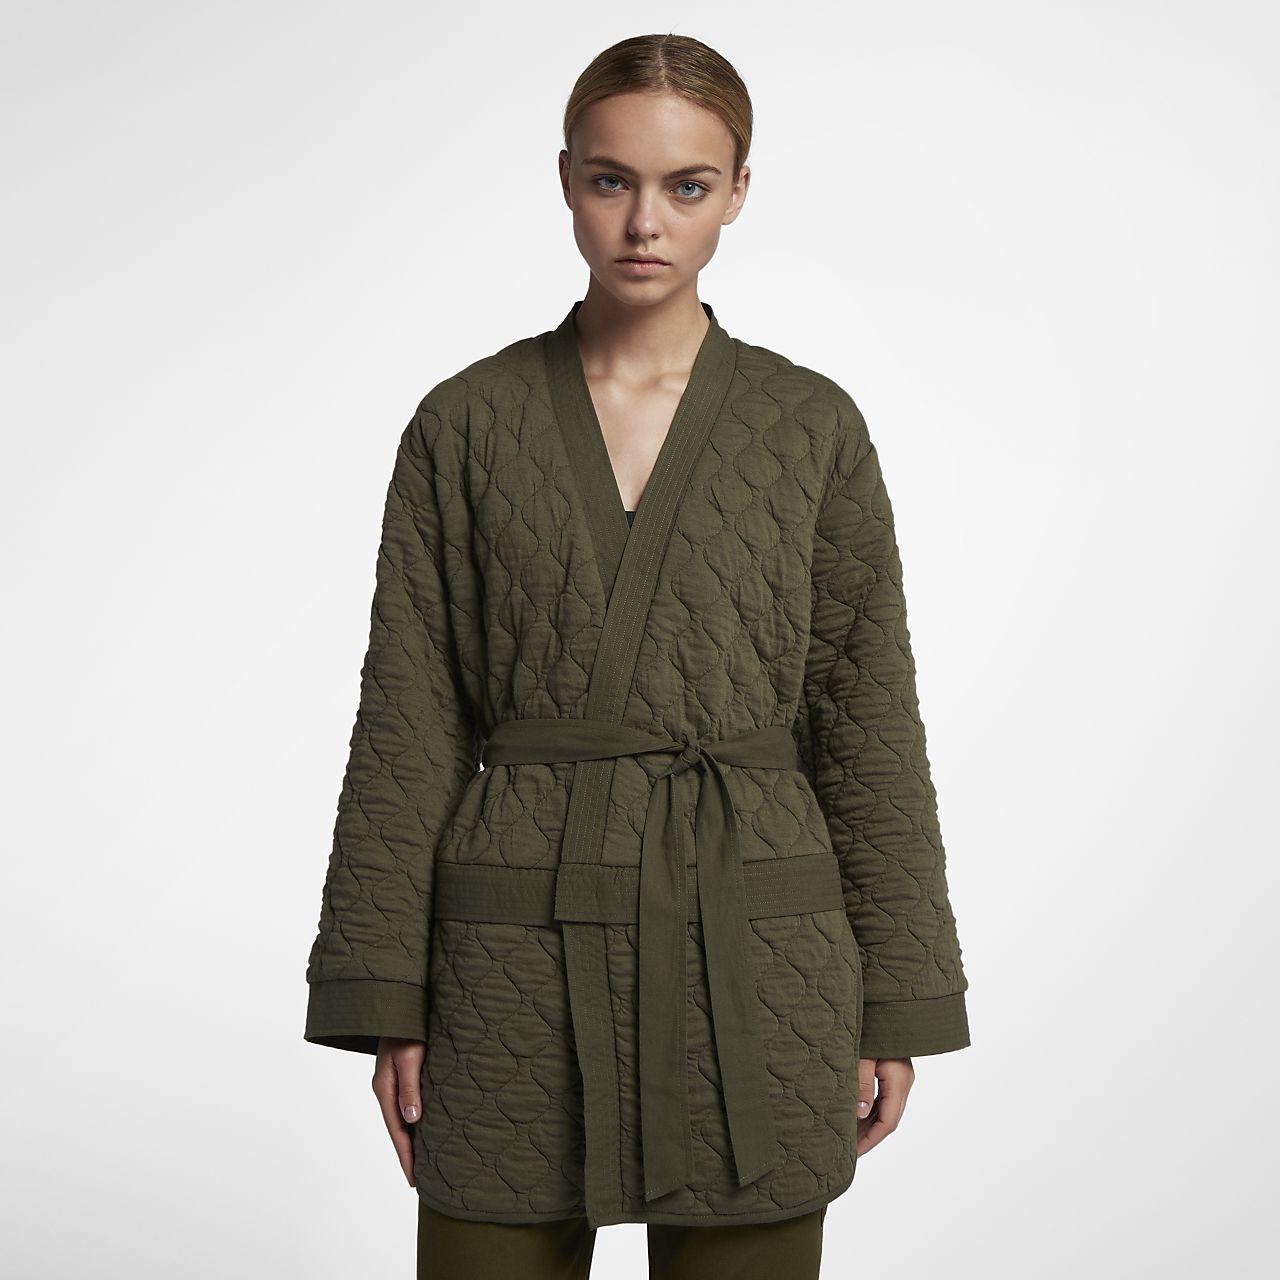 Hurley Hollowknit Wrap Women's Fleece Top